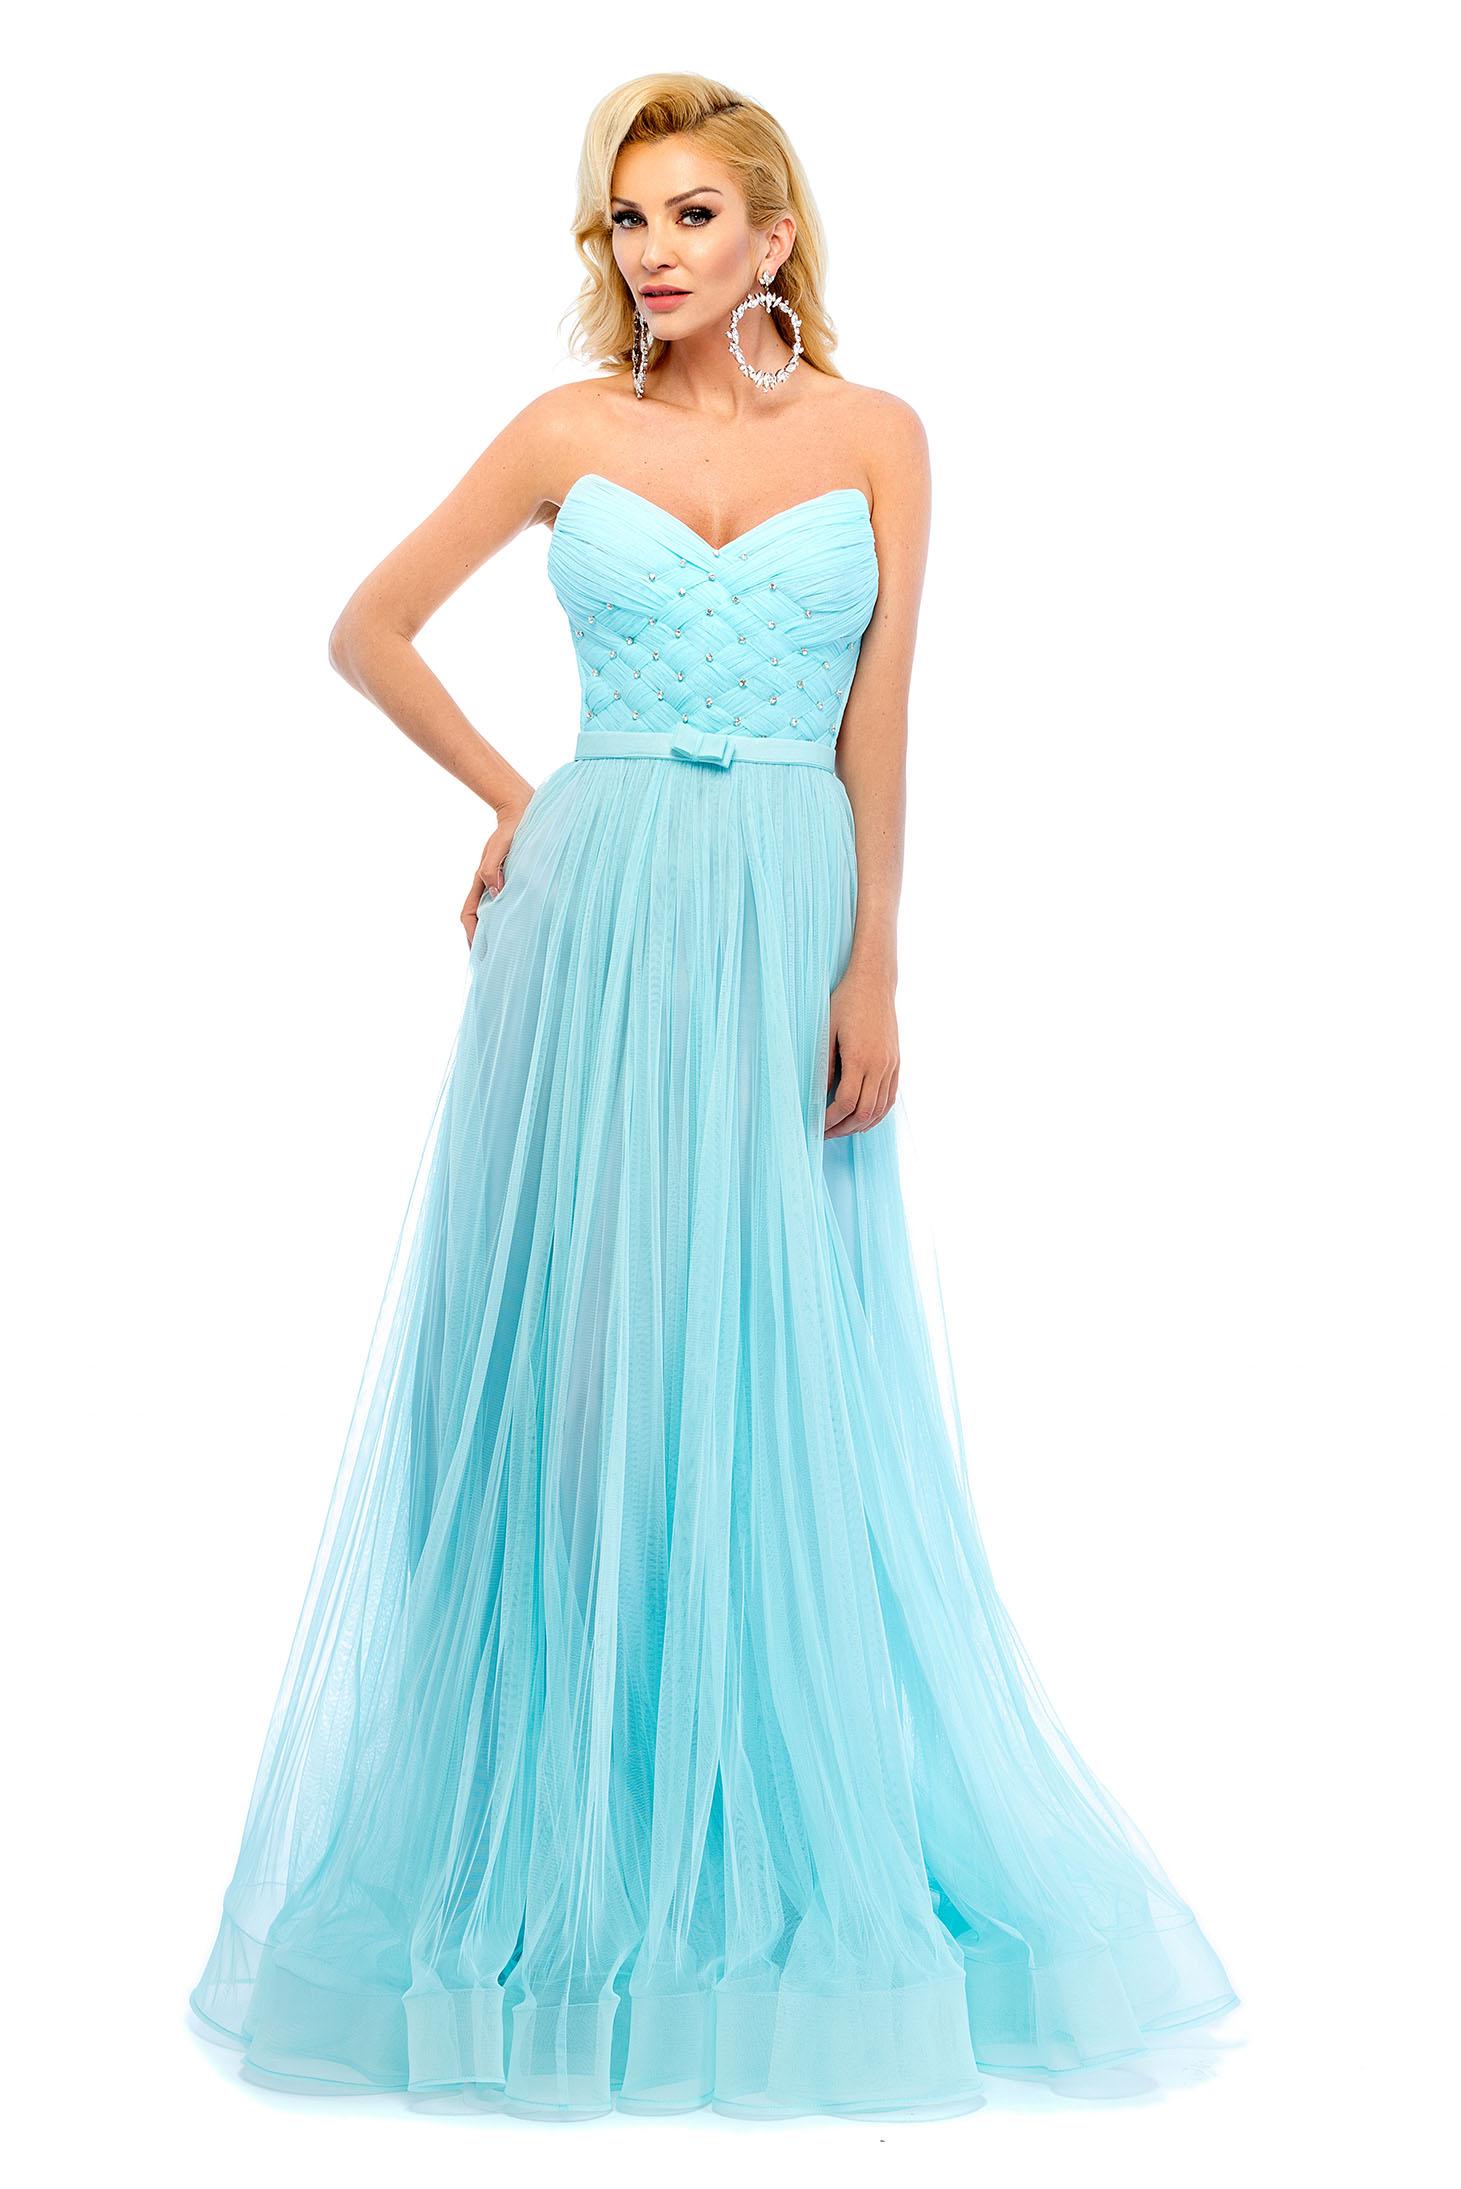 Ana Radu turquoise evening dresses off shoulder dress push-up bra